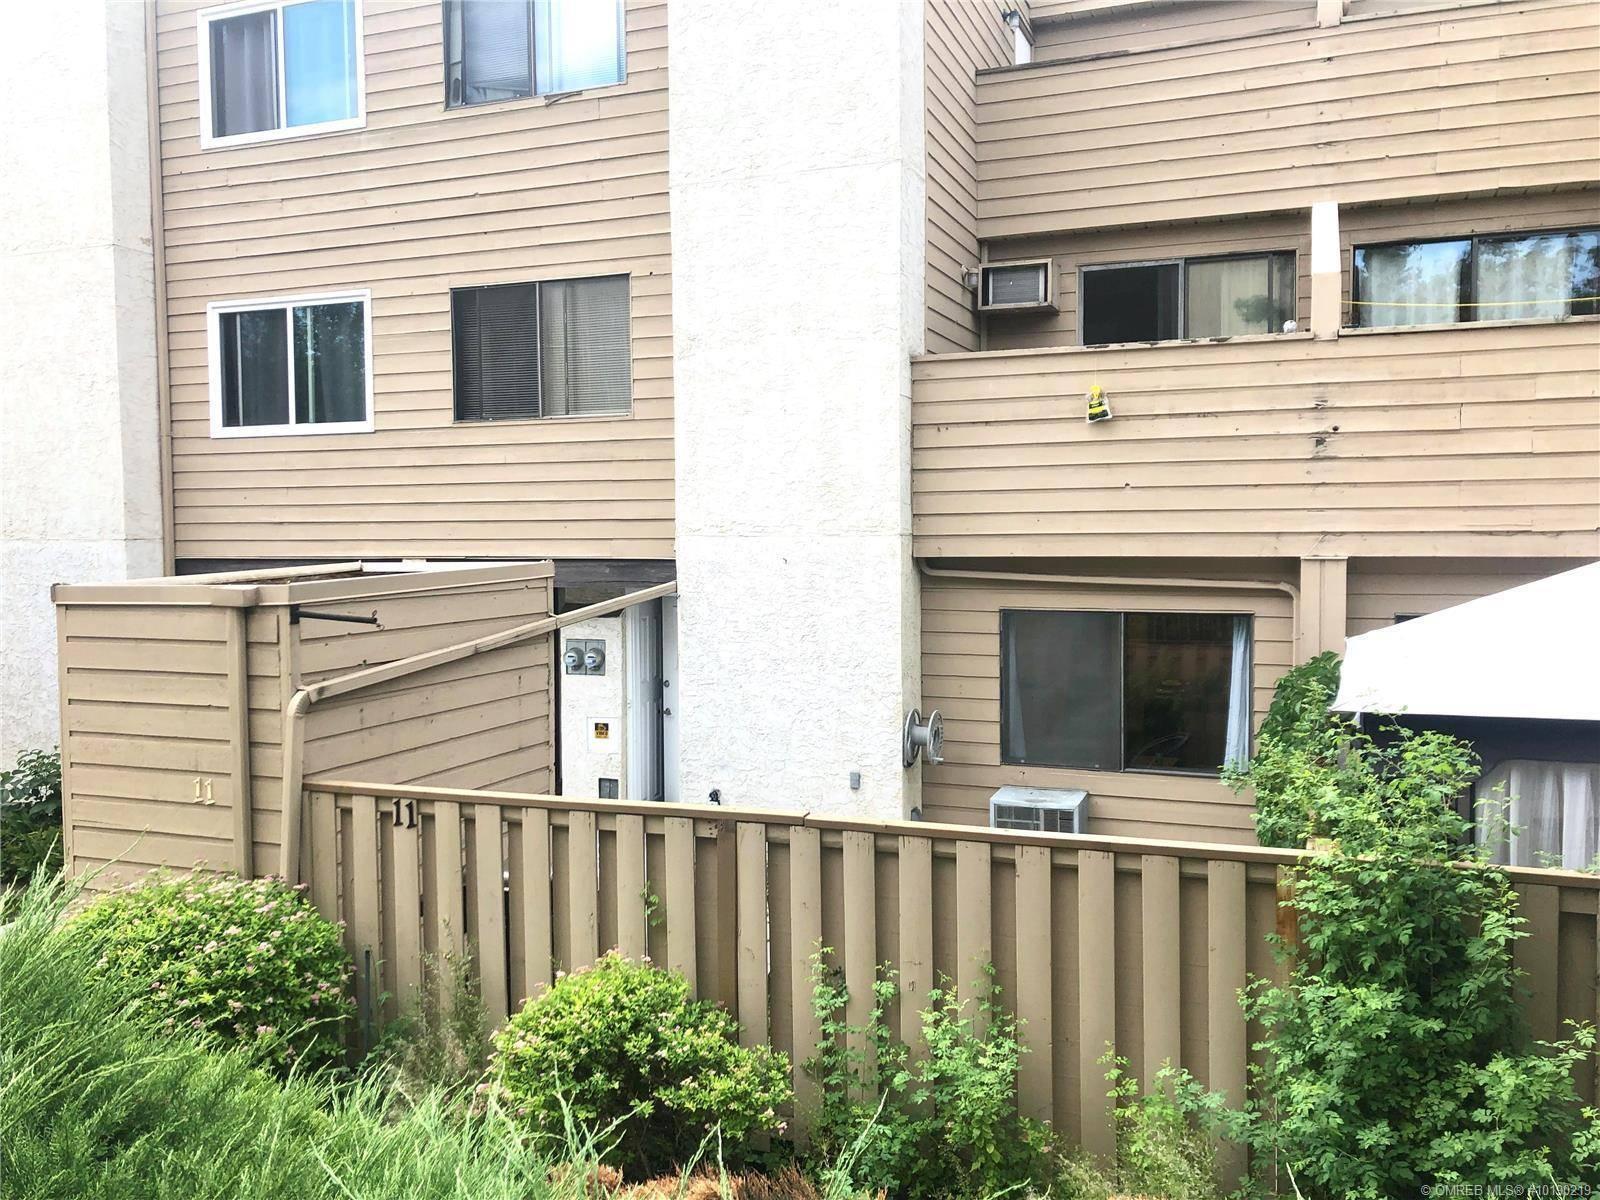 Townhouse for sale at 1481 Inkar Rd Unit 11 Kelowna British Columbia - MLS: 10190219